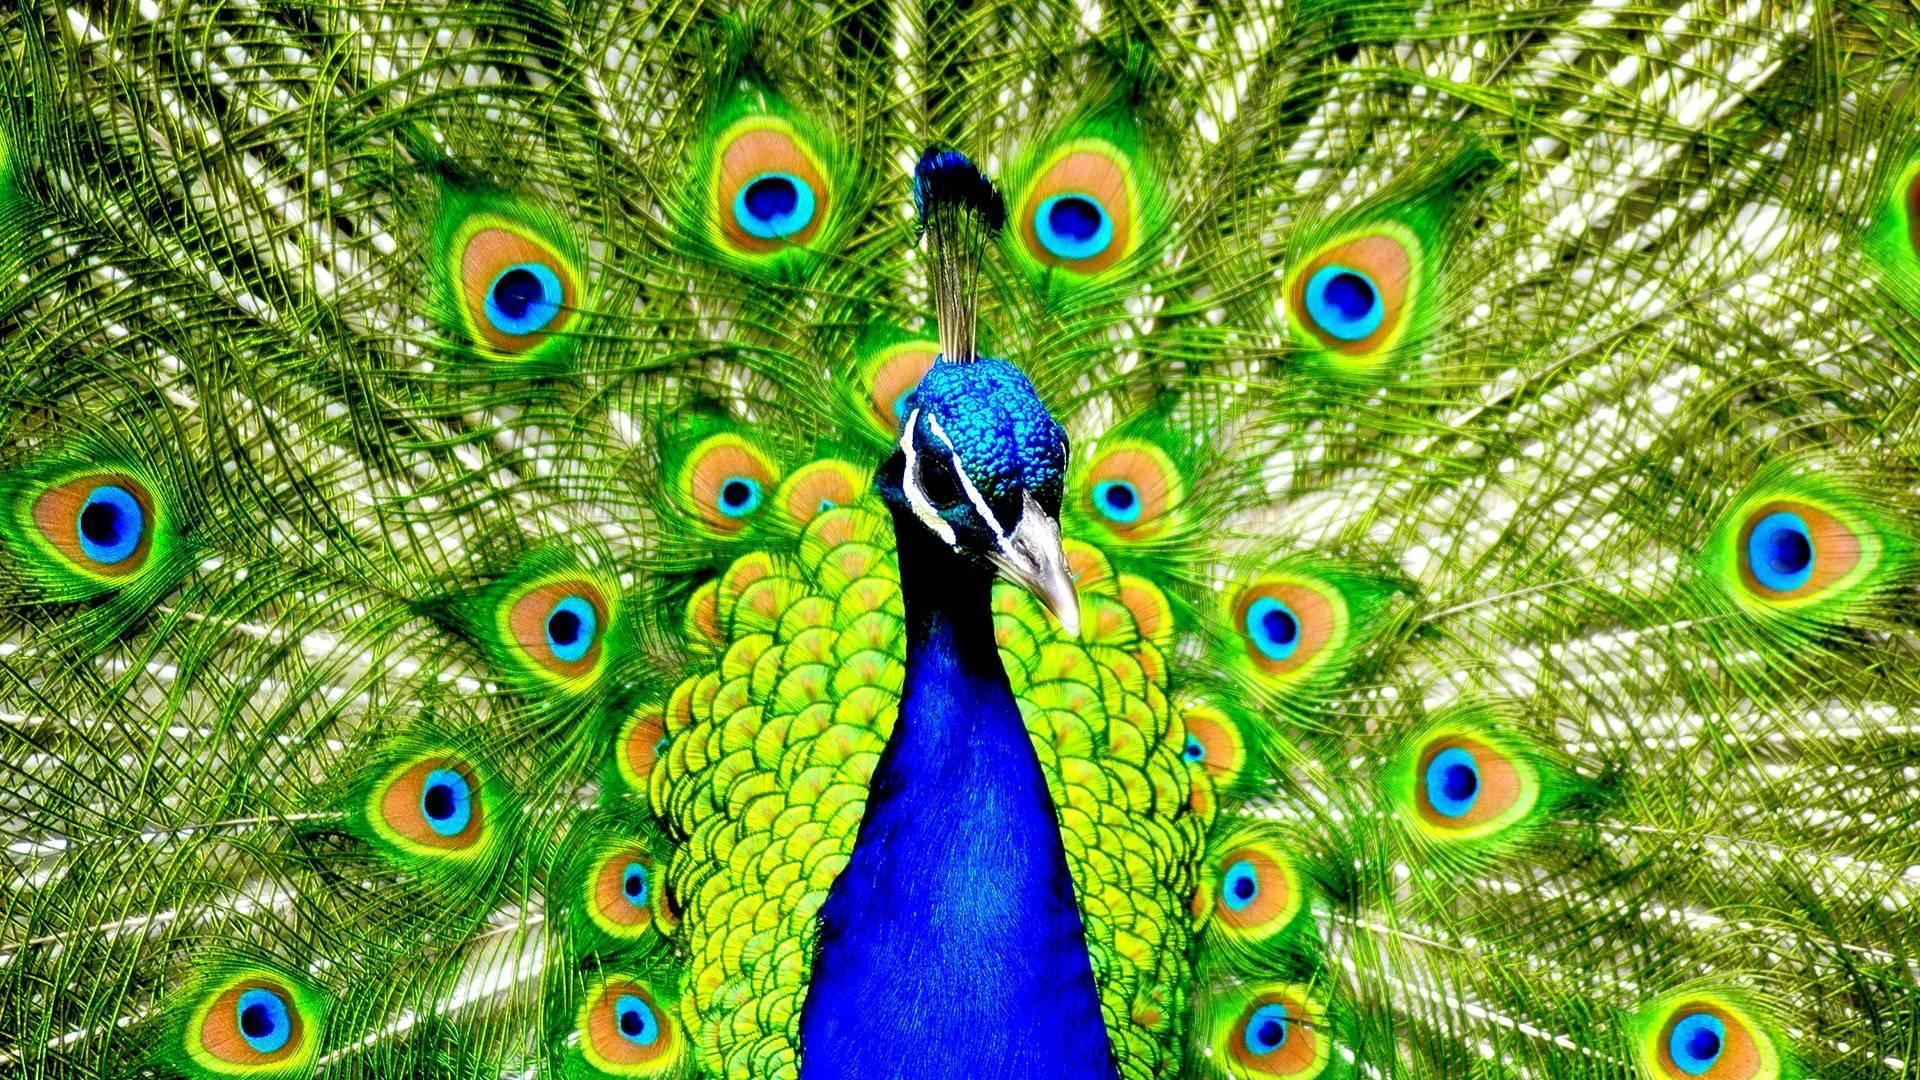 Peacock Hd Wallpapers  7Wallpapersnet-5075